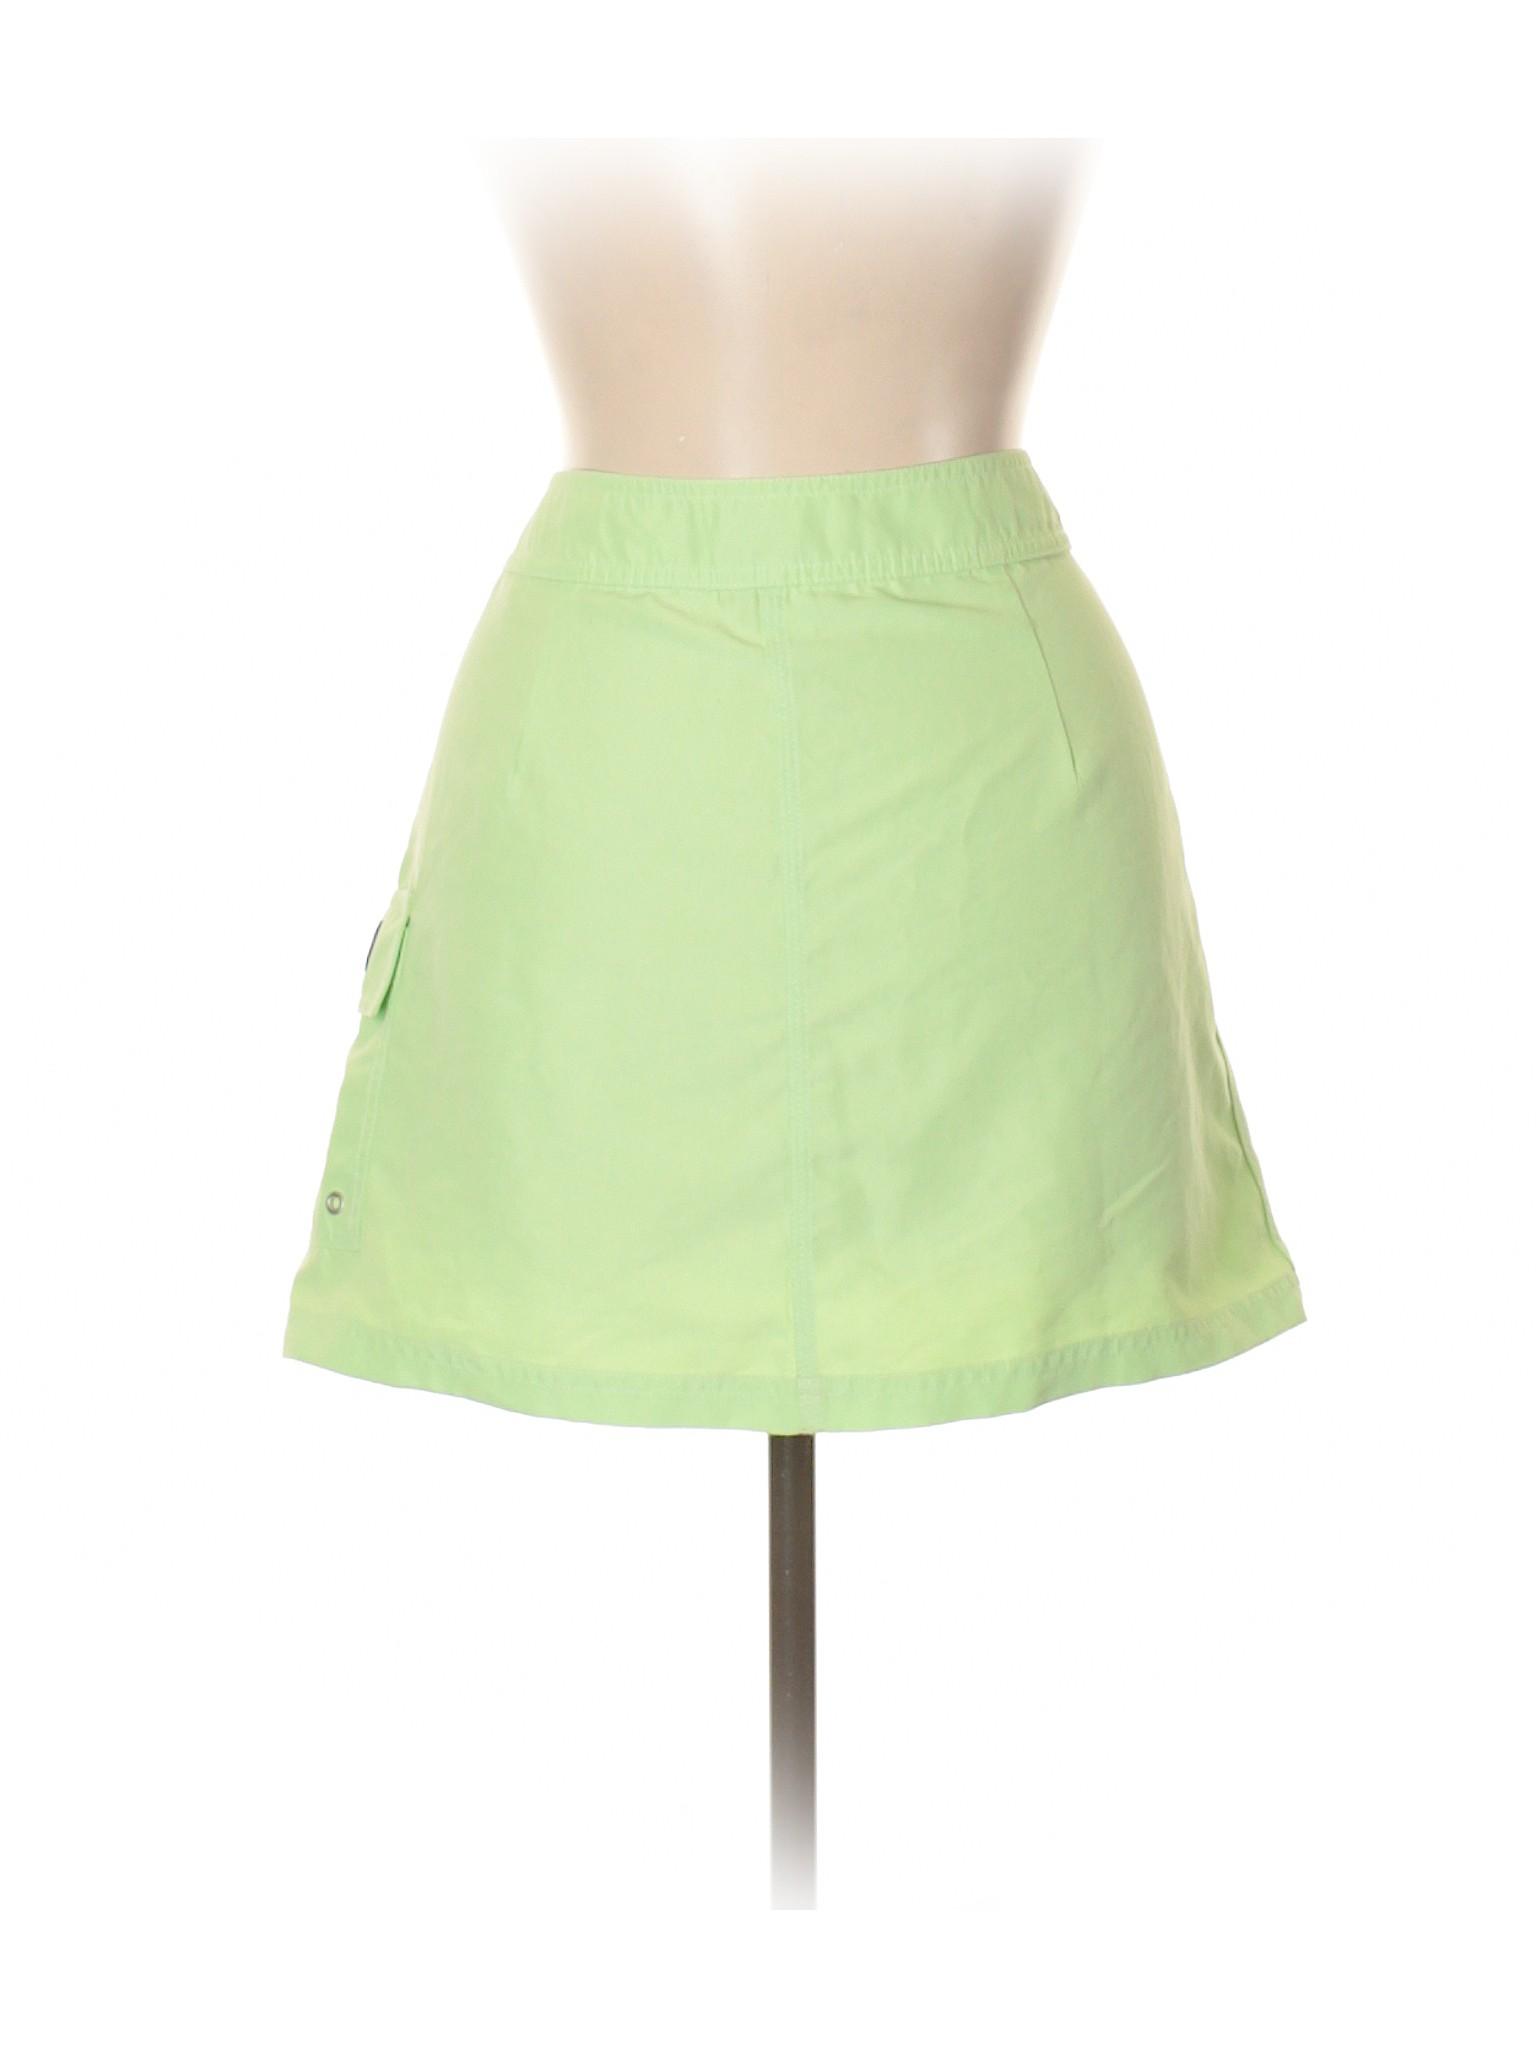 Casual Skirt Boutique Vineyard Leisure Vines qZ7zxACtw